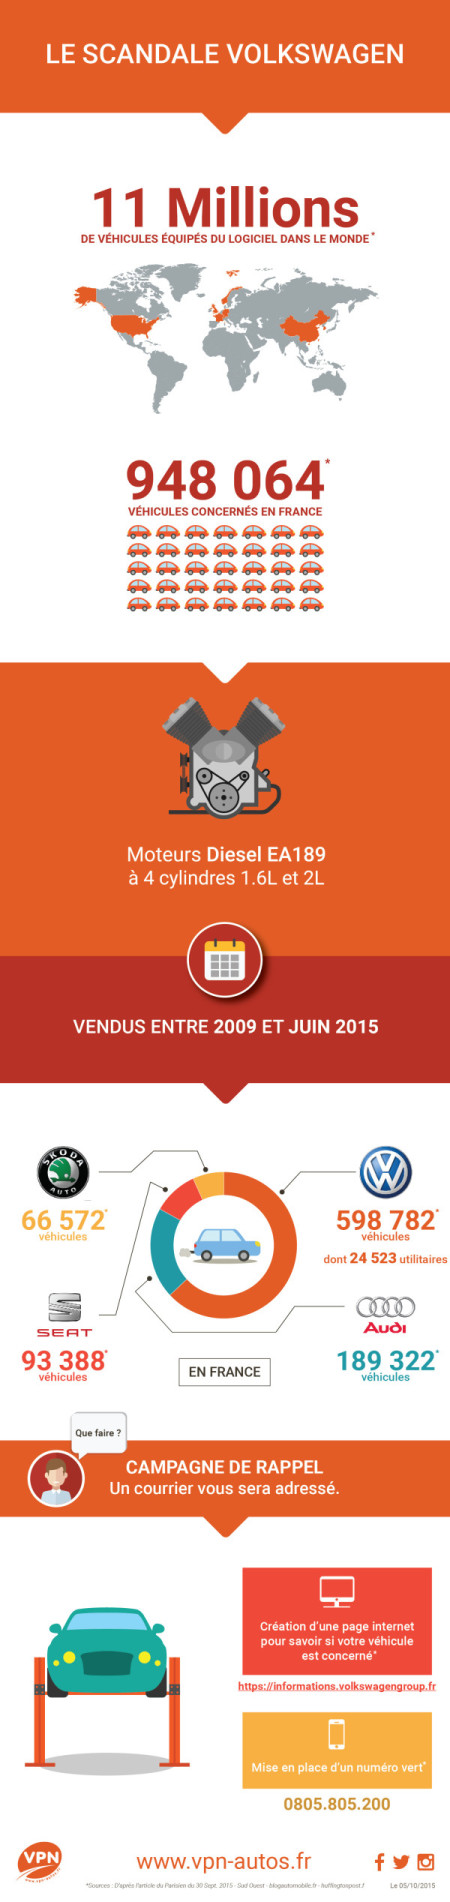 Infographie sur ll'affaire volkswagen